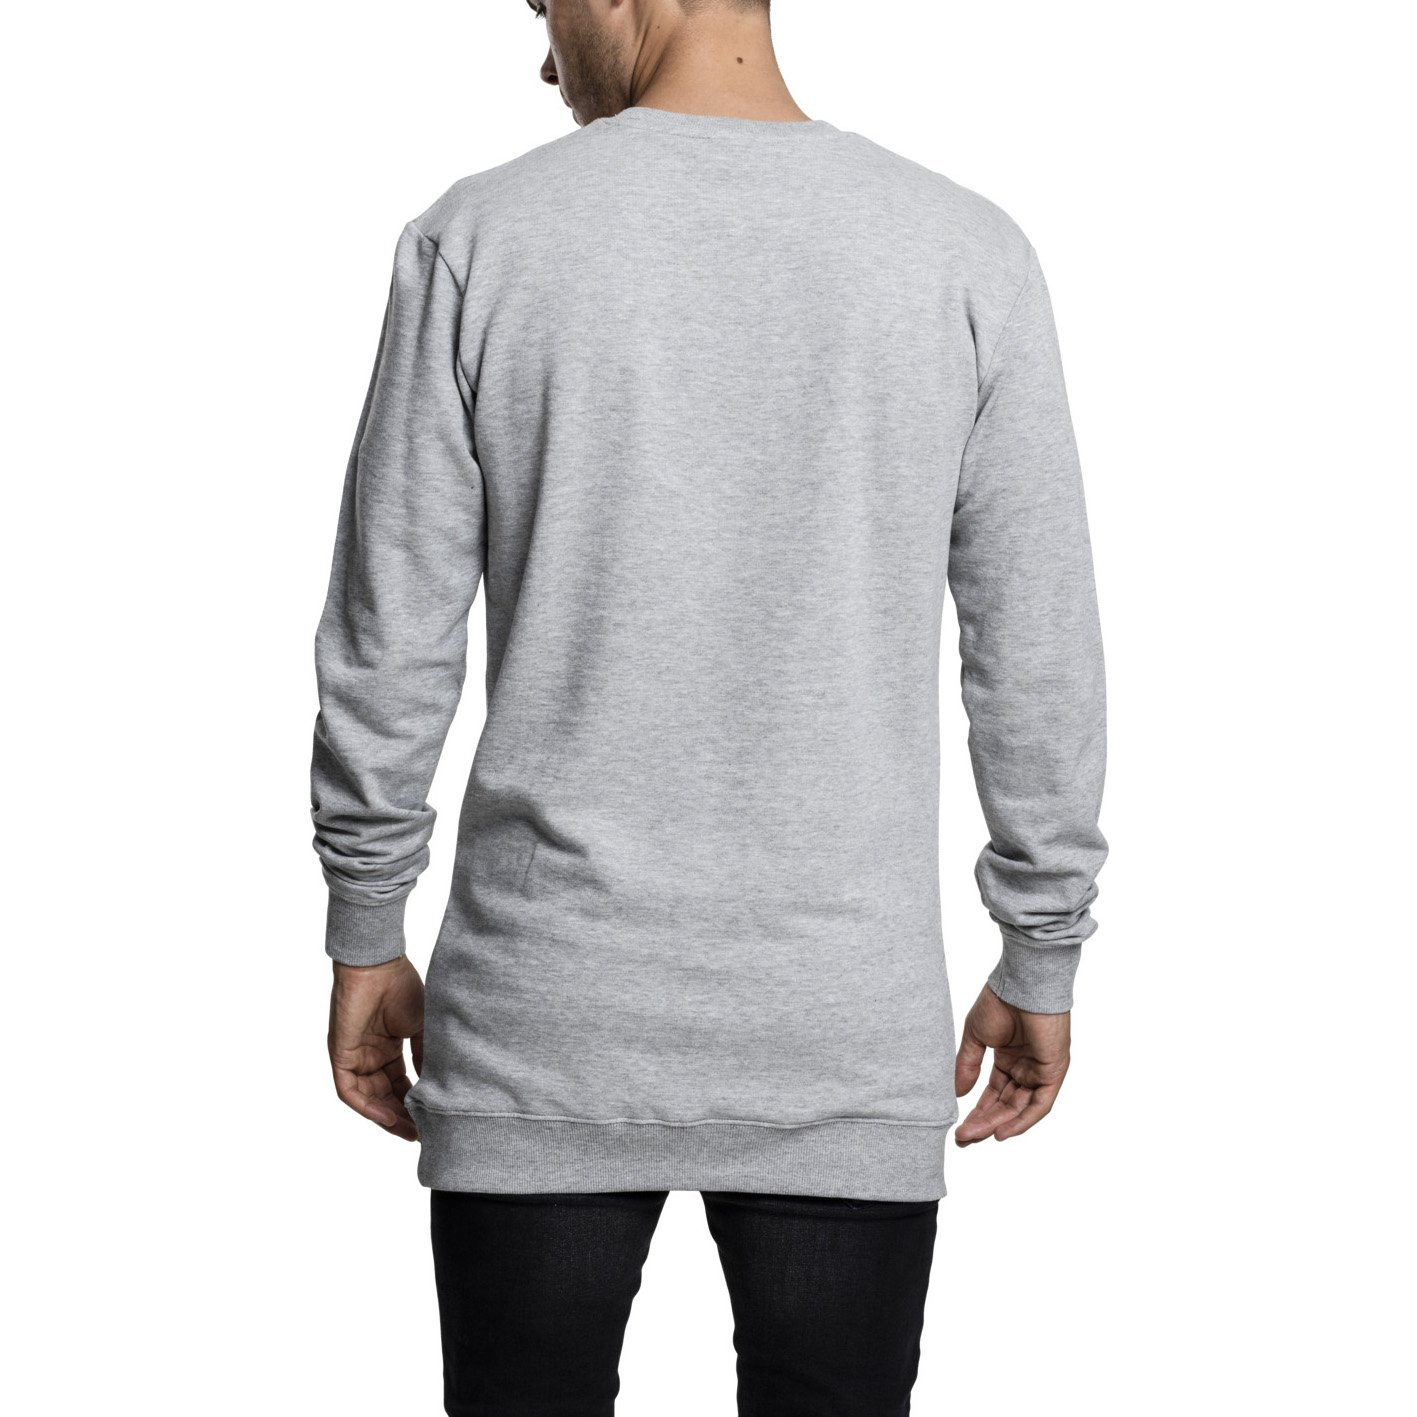 Urban-Classics-Long-Light-Fleece-Crewneck-Pullover